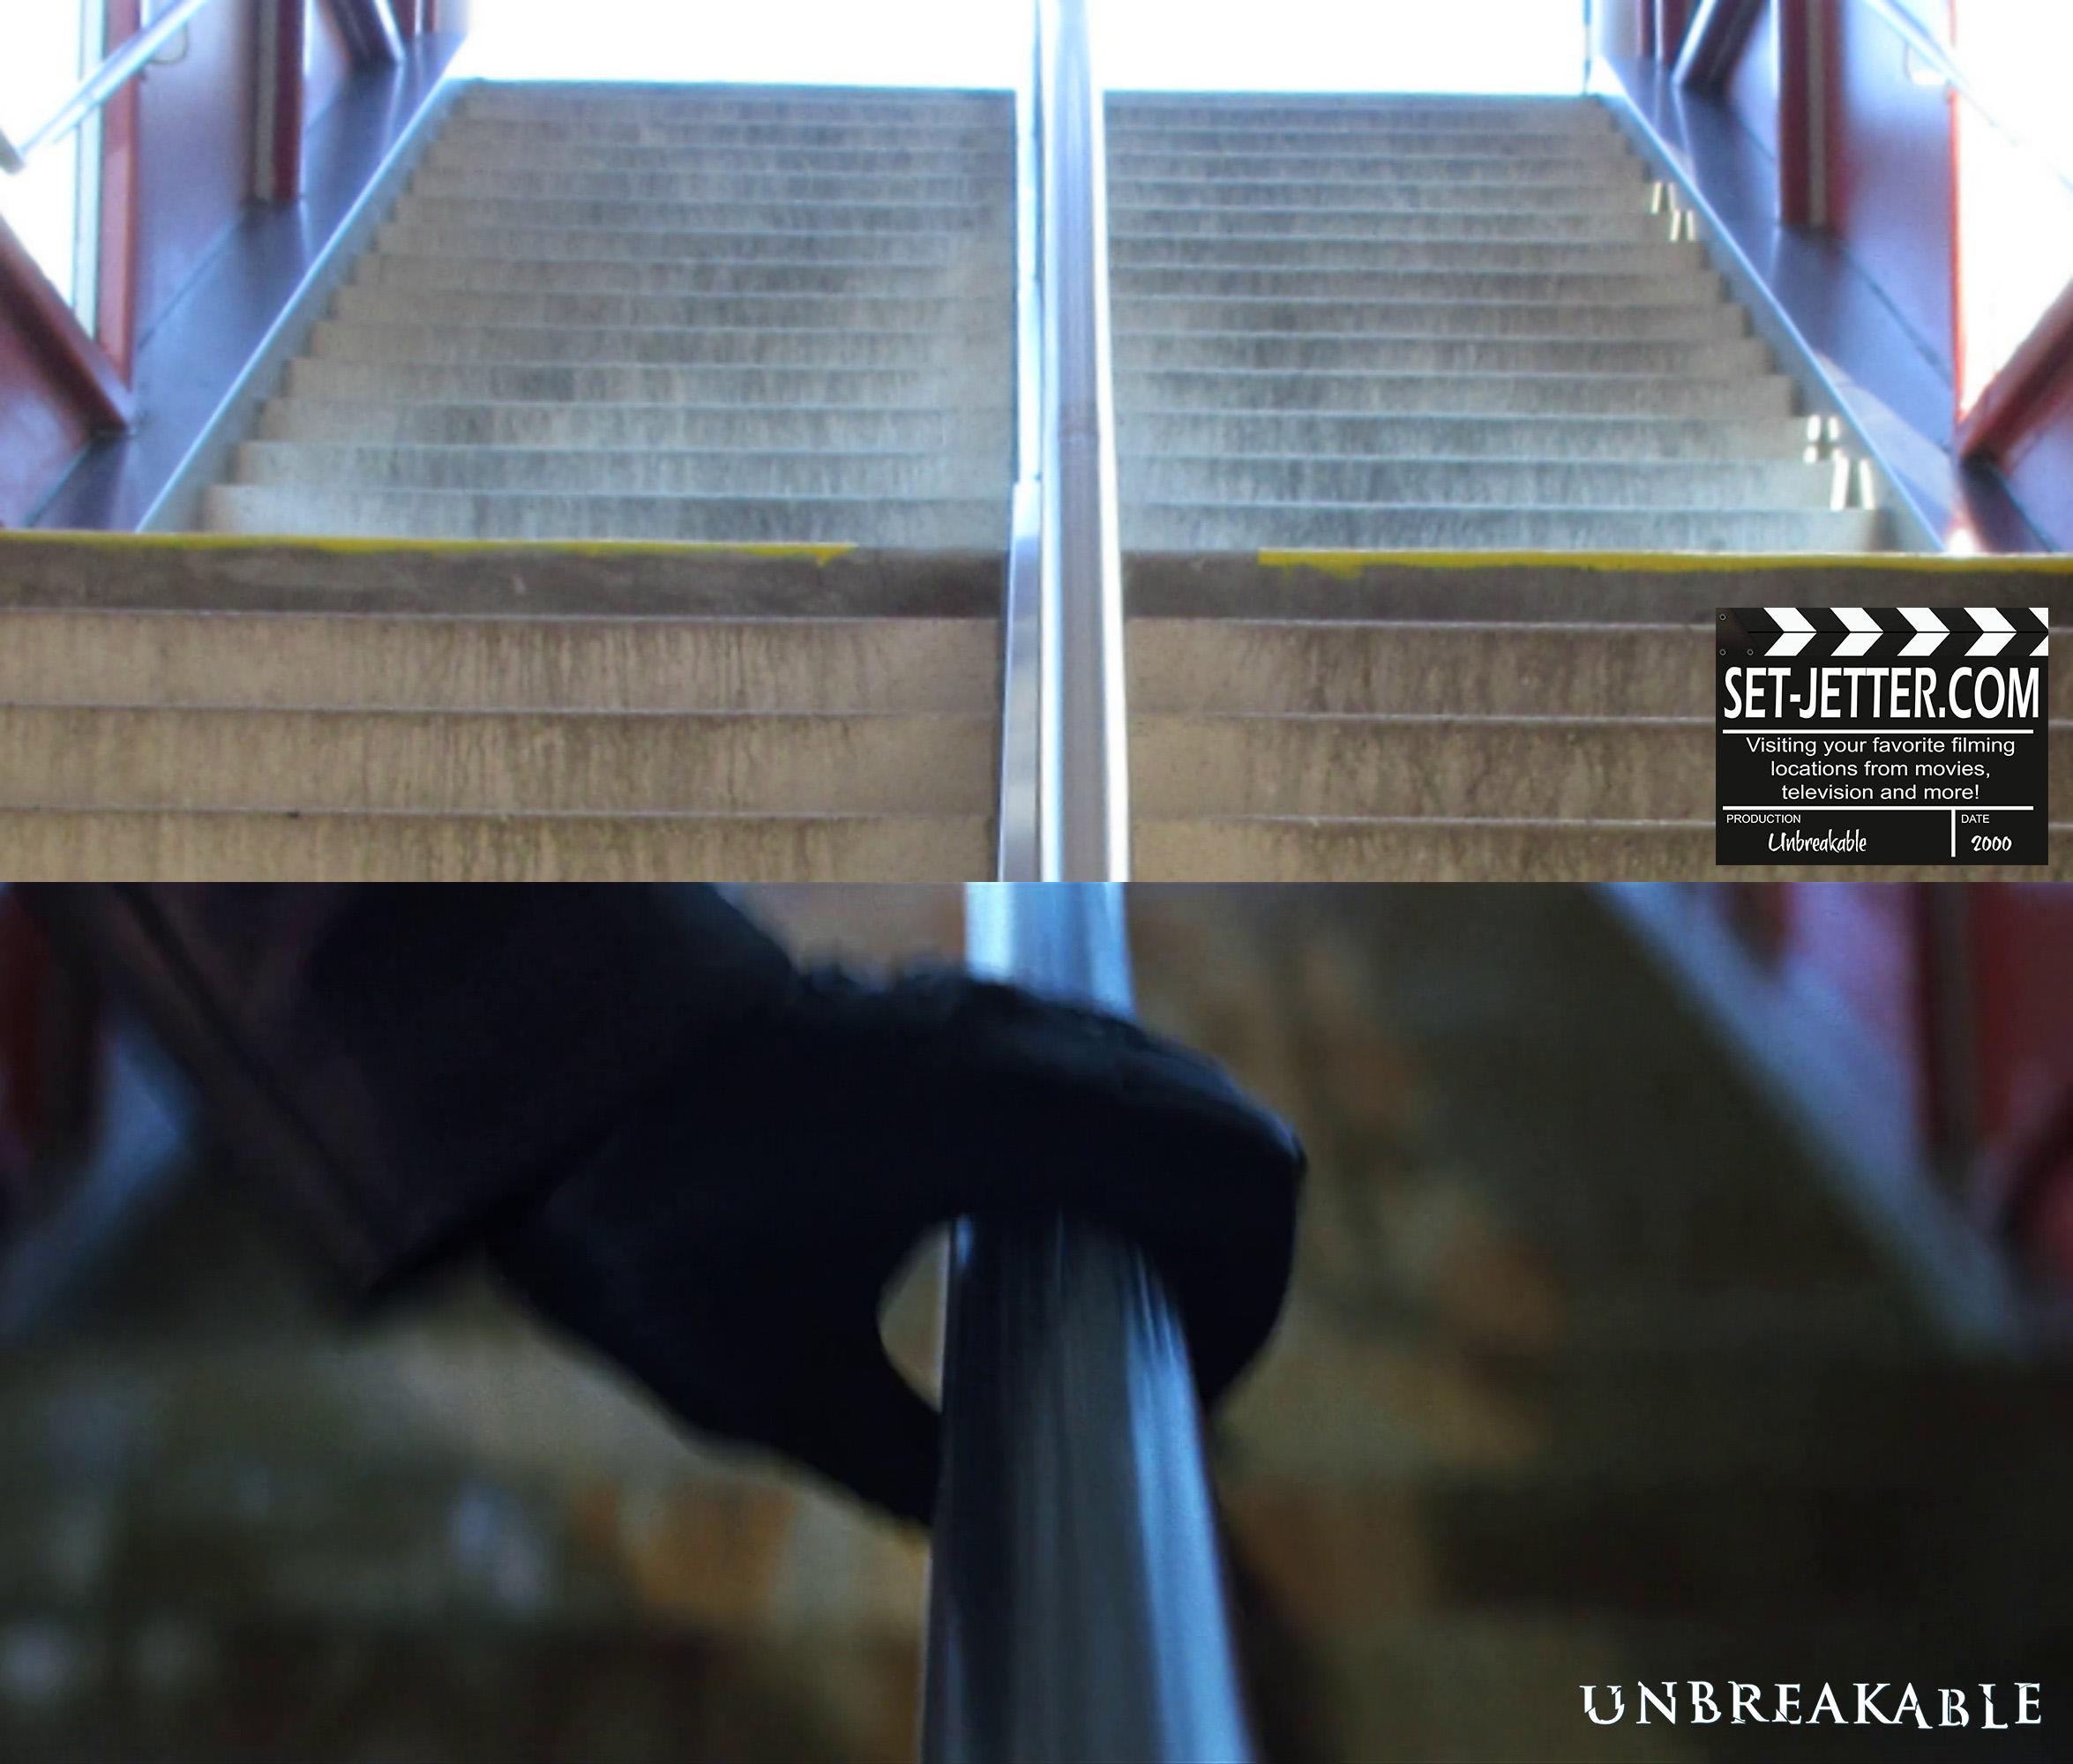 Unbreakable 083.jpg